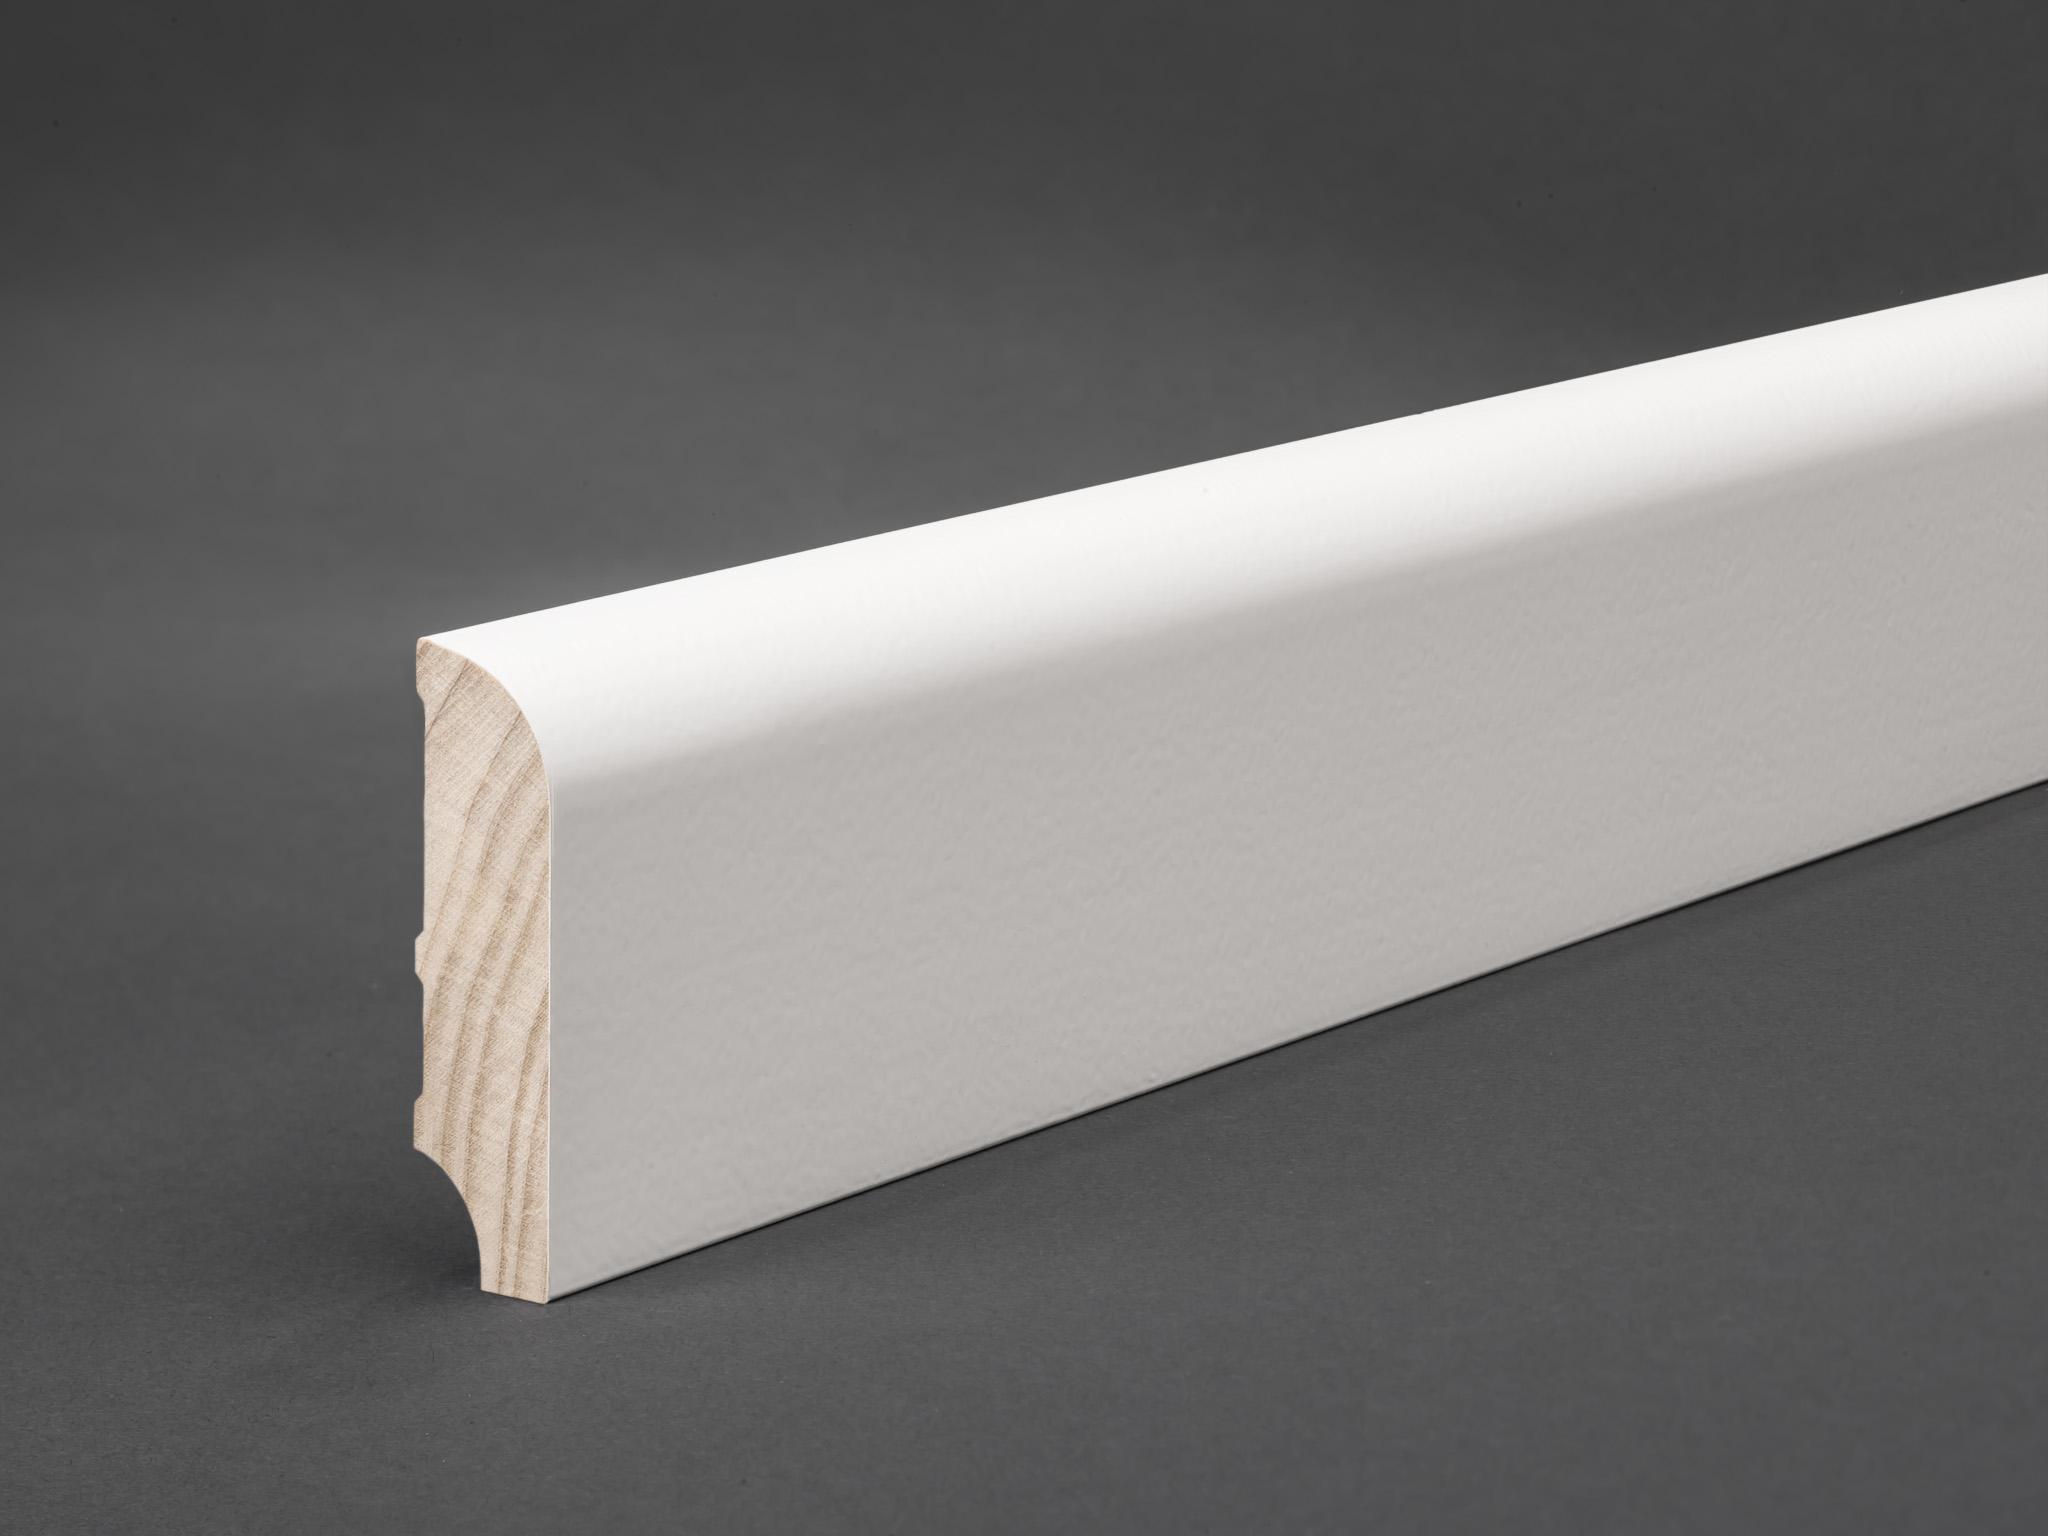 massivholz wei lackiert 60x16 mm oberkante abgerundet fu leisten welt. Black Bedroom Furniture Sets. Home Design Ideas